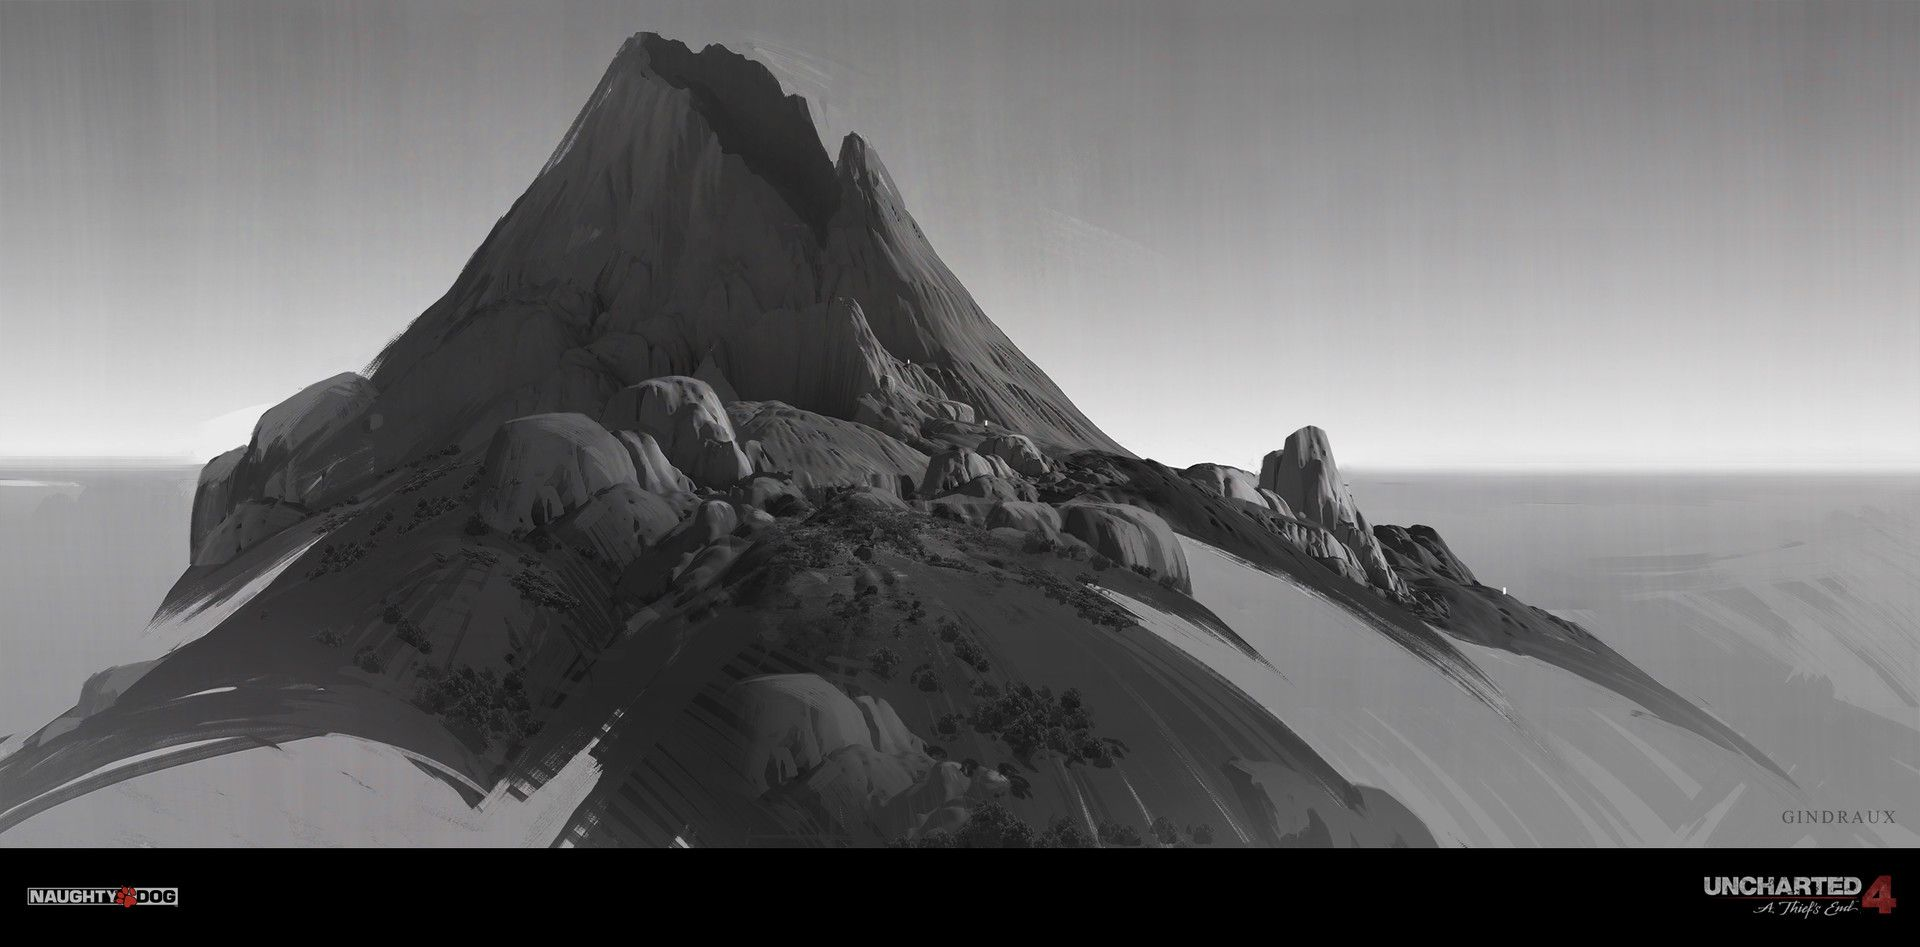 Artstation Uncharted 4 Volcano Nick Gindraux